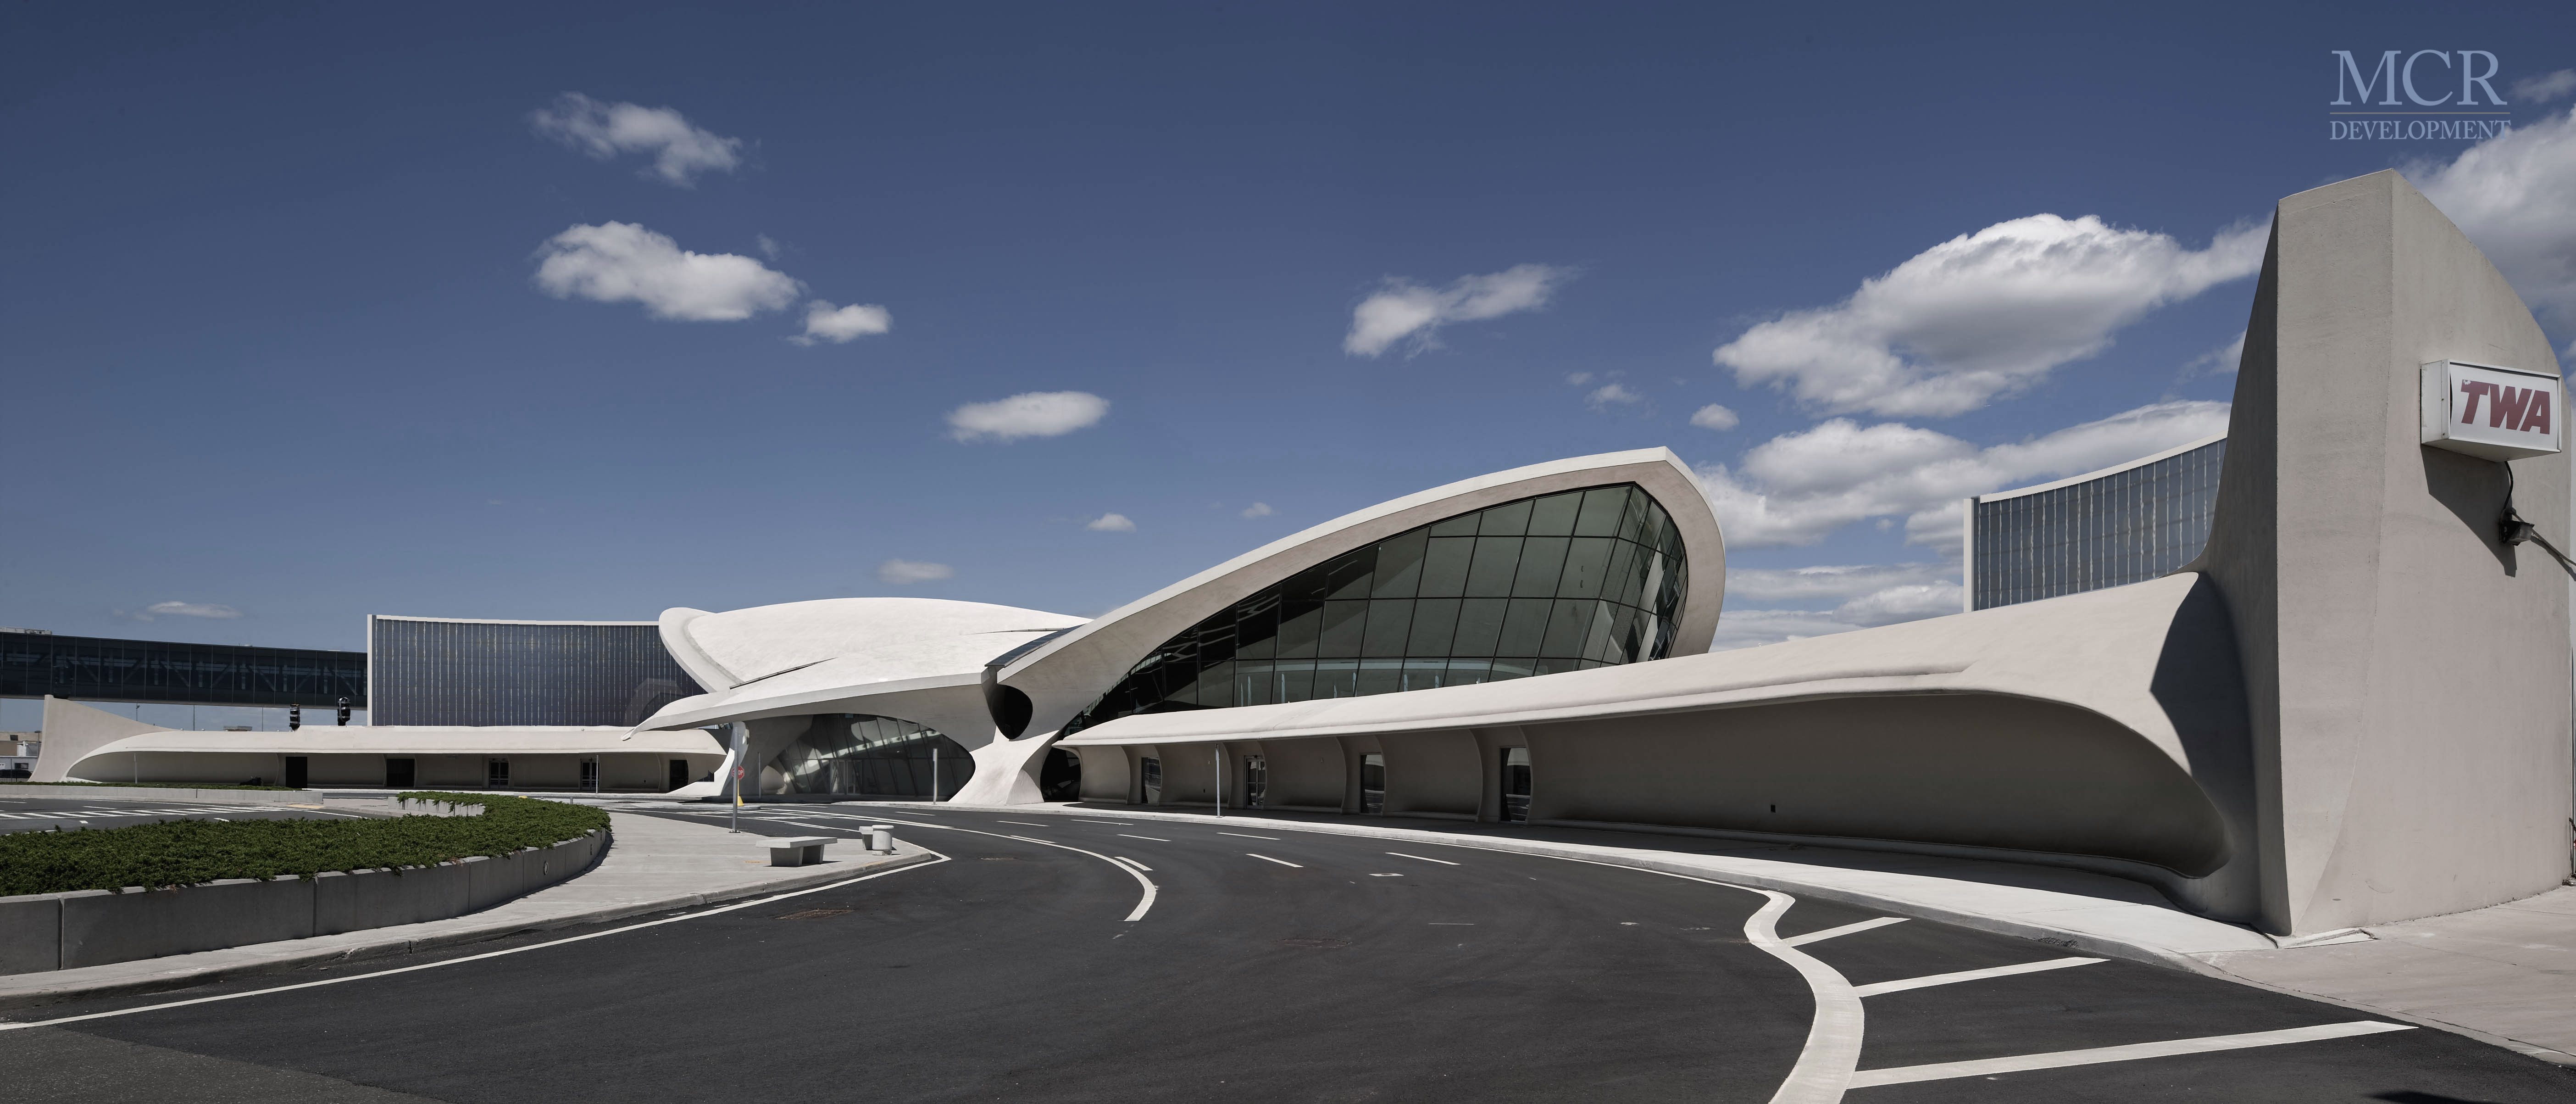 Rendering of the TWA Flight Center Hotel. Via MCR Development.